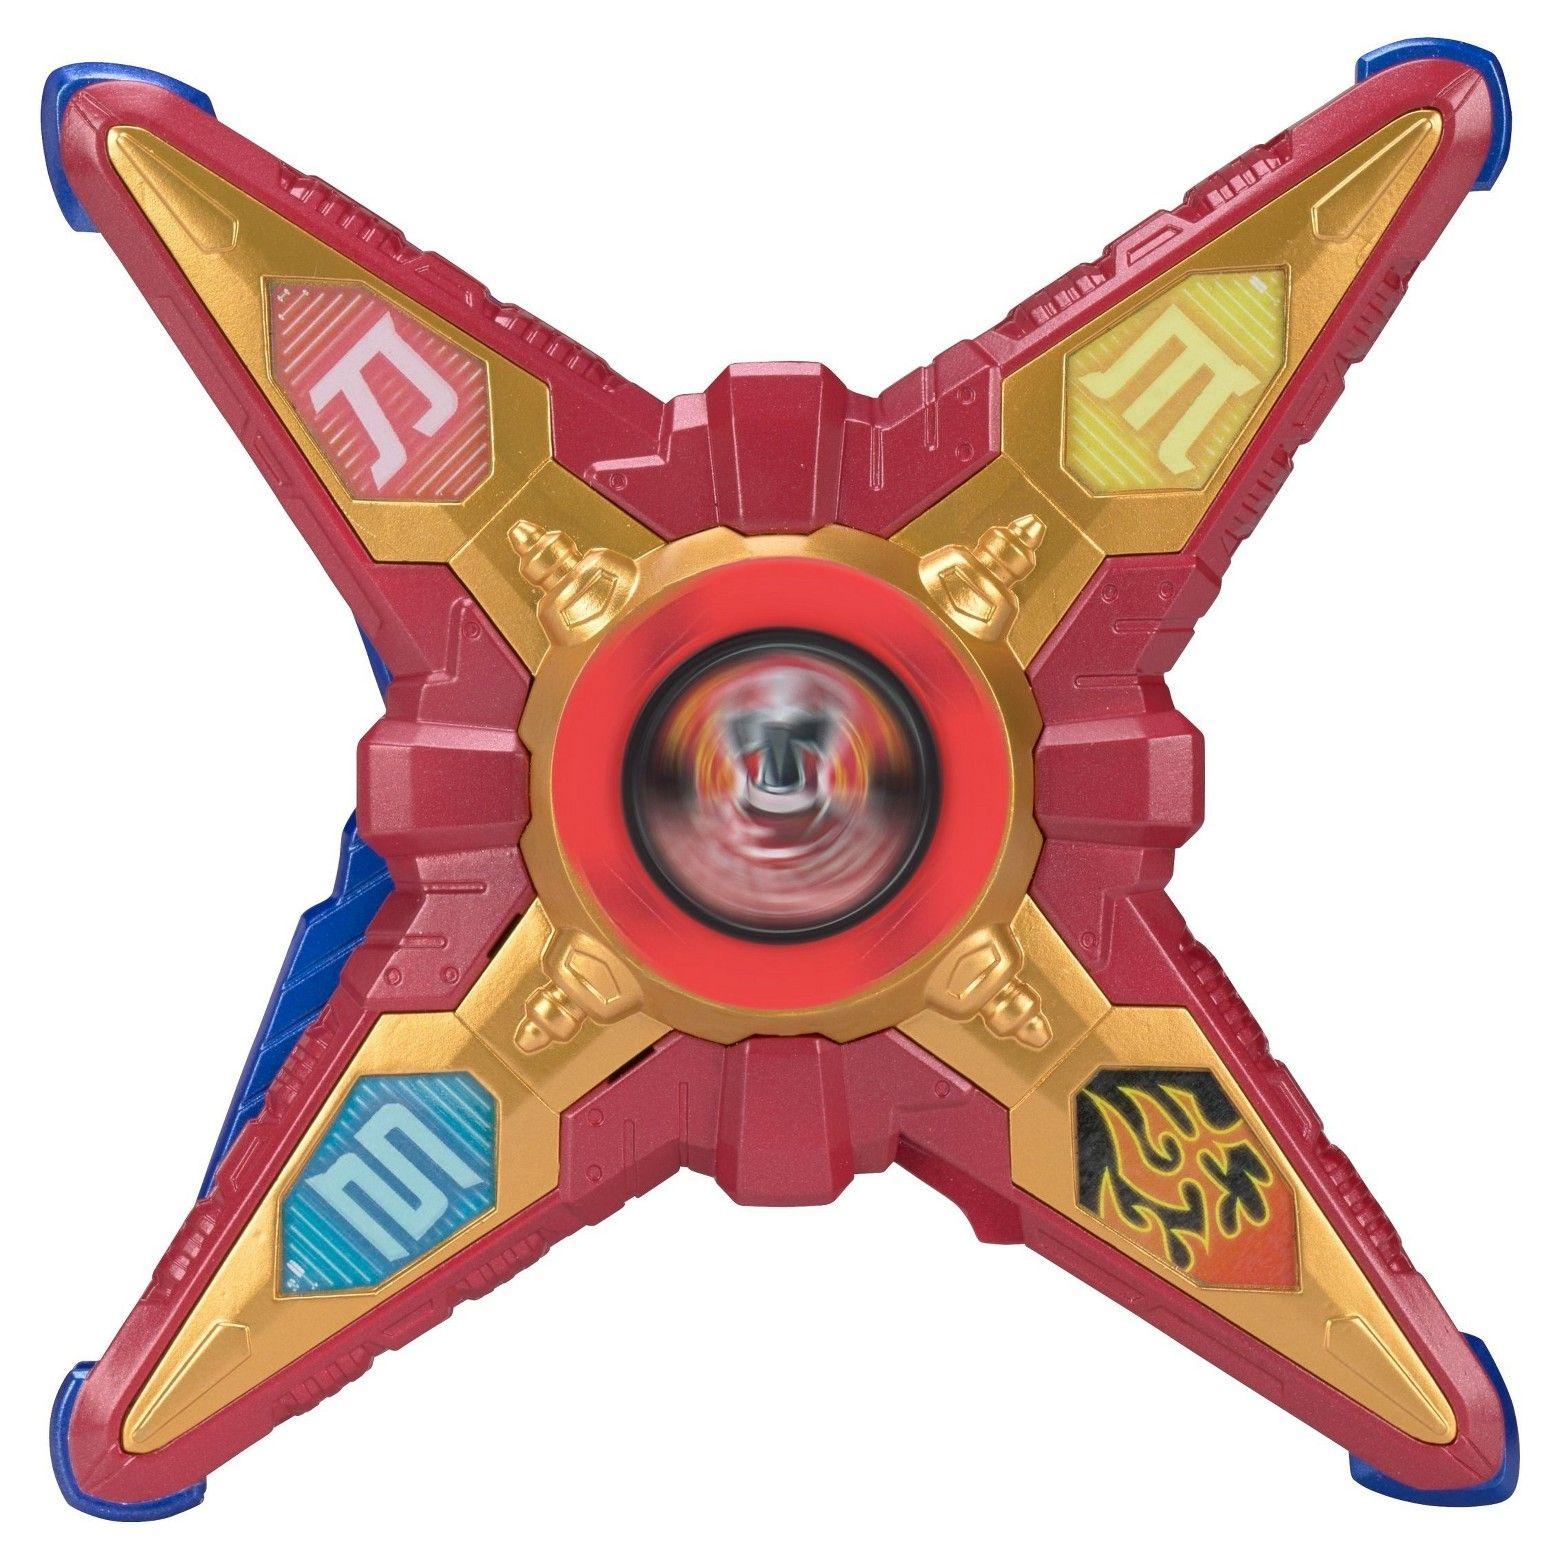 Power Rangers Ninja Steel - DX Ninja Battle Morpher